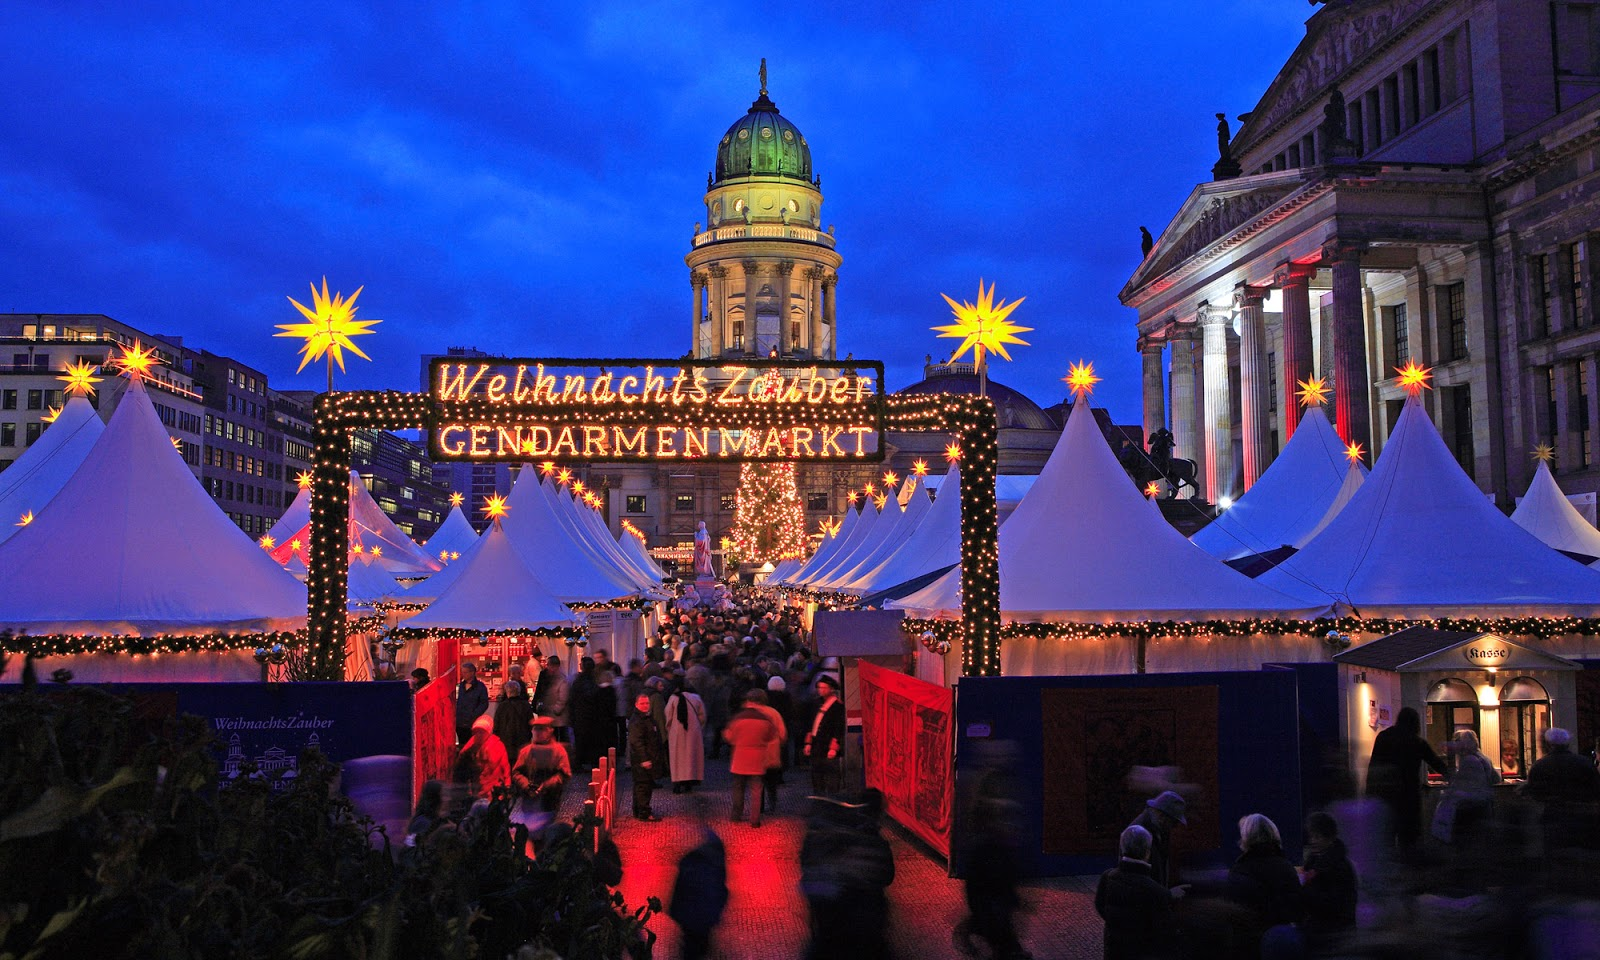 Weihnachtszauber Christmas market in Berlin